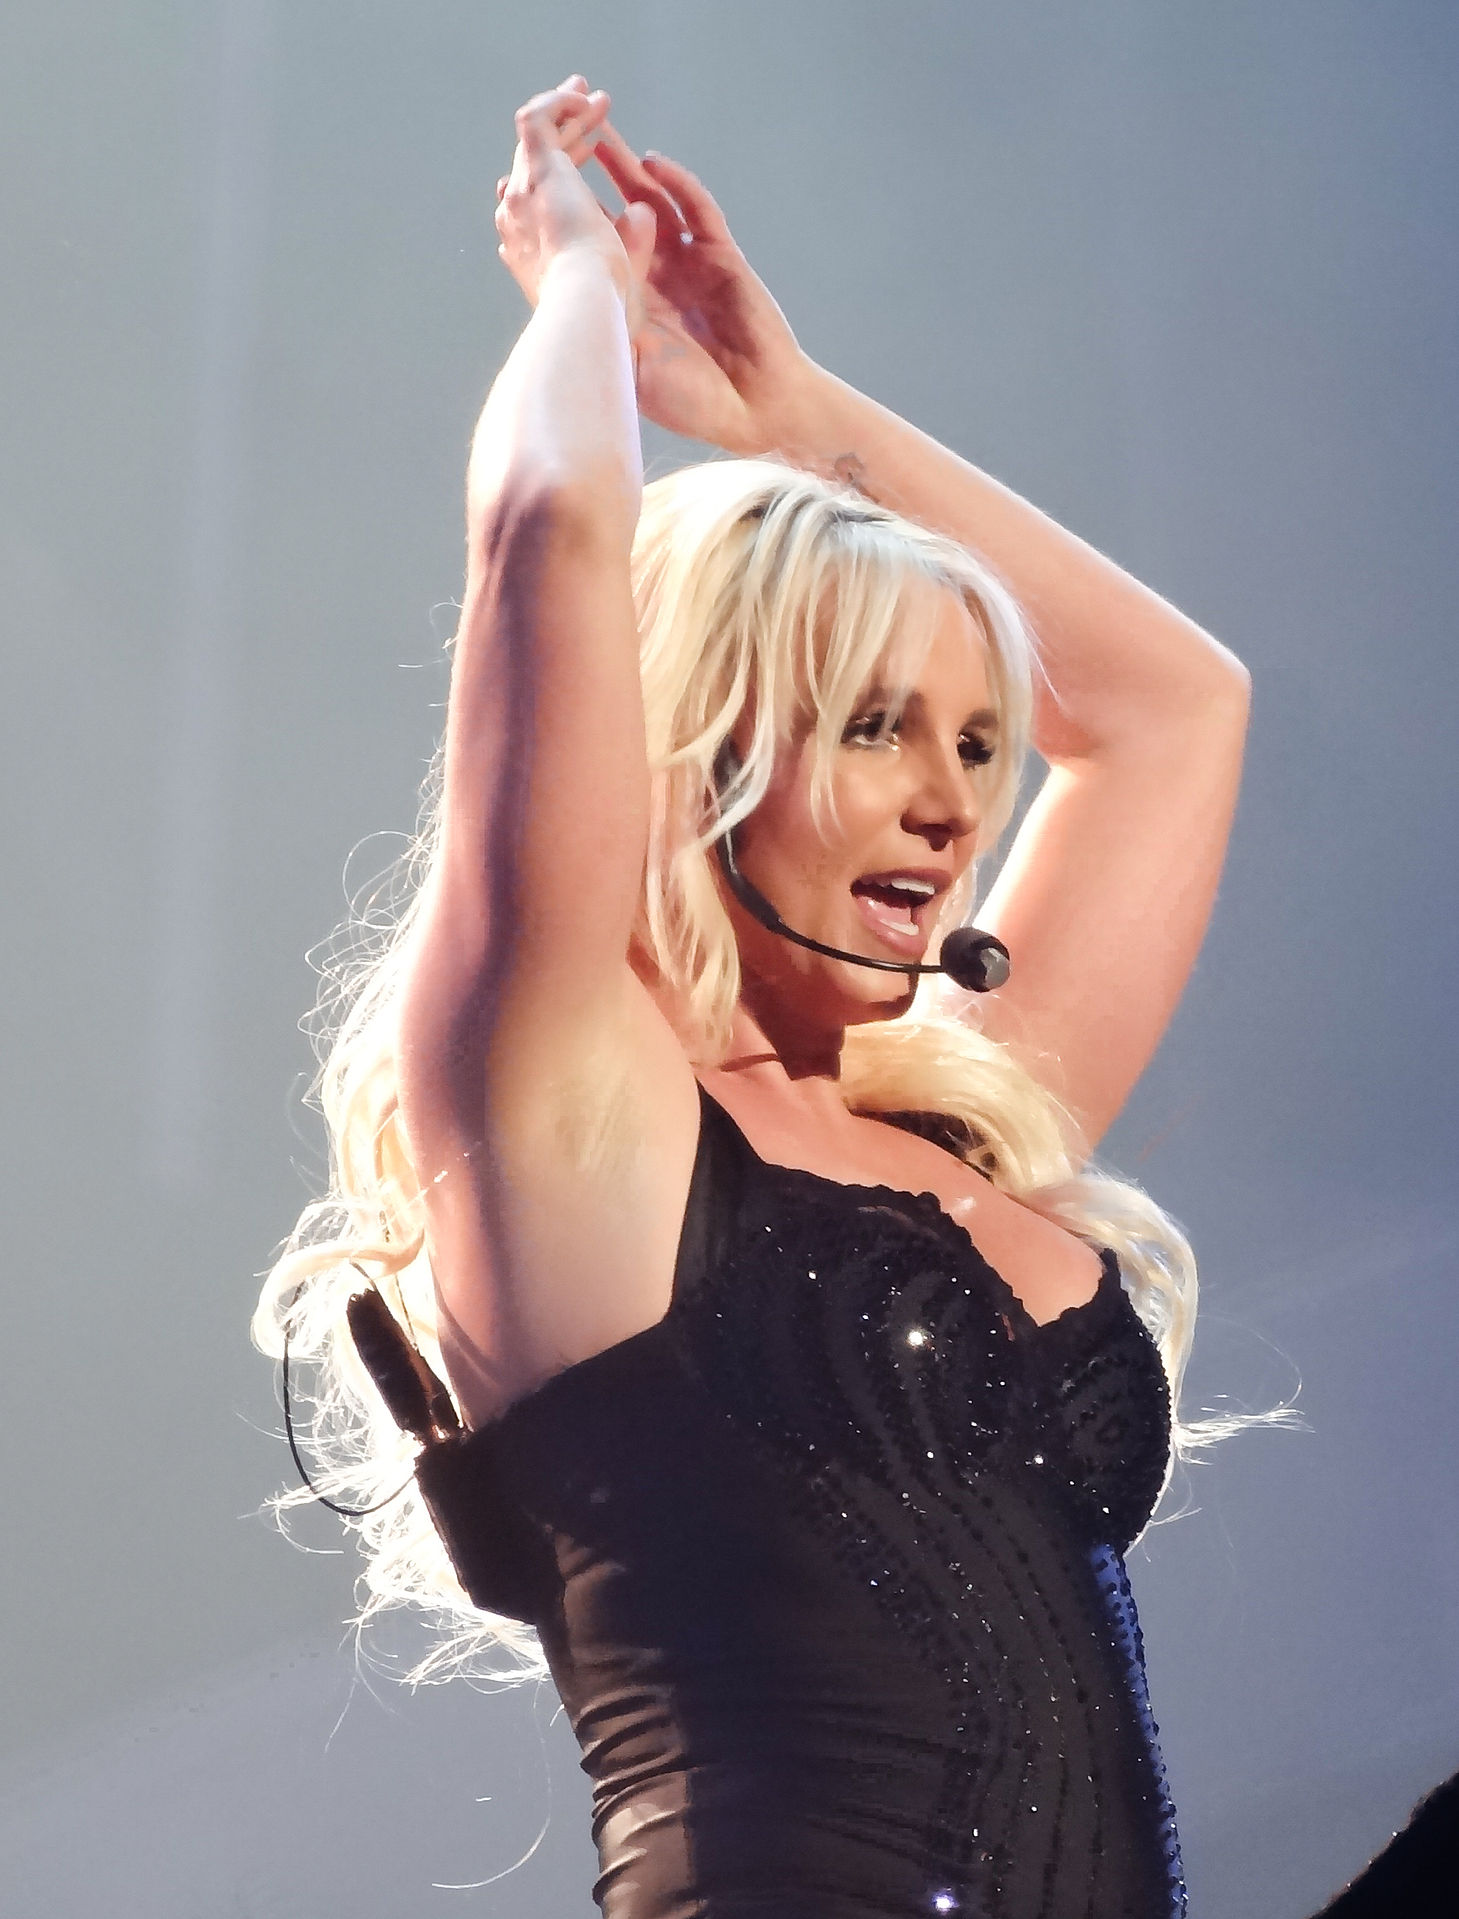 1459px-BritneyPOM19.jpg